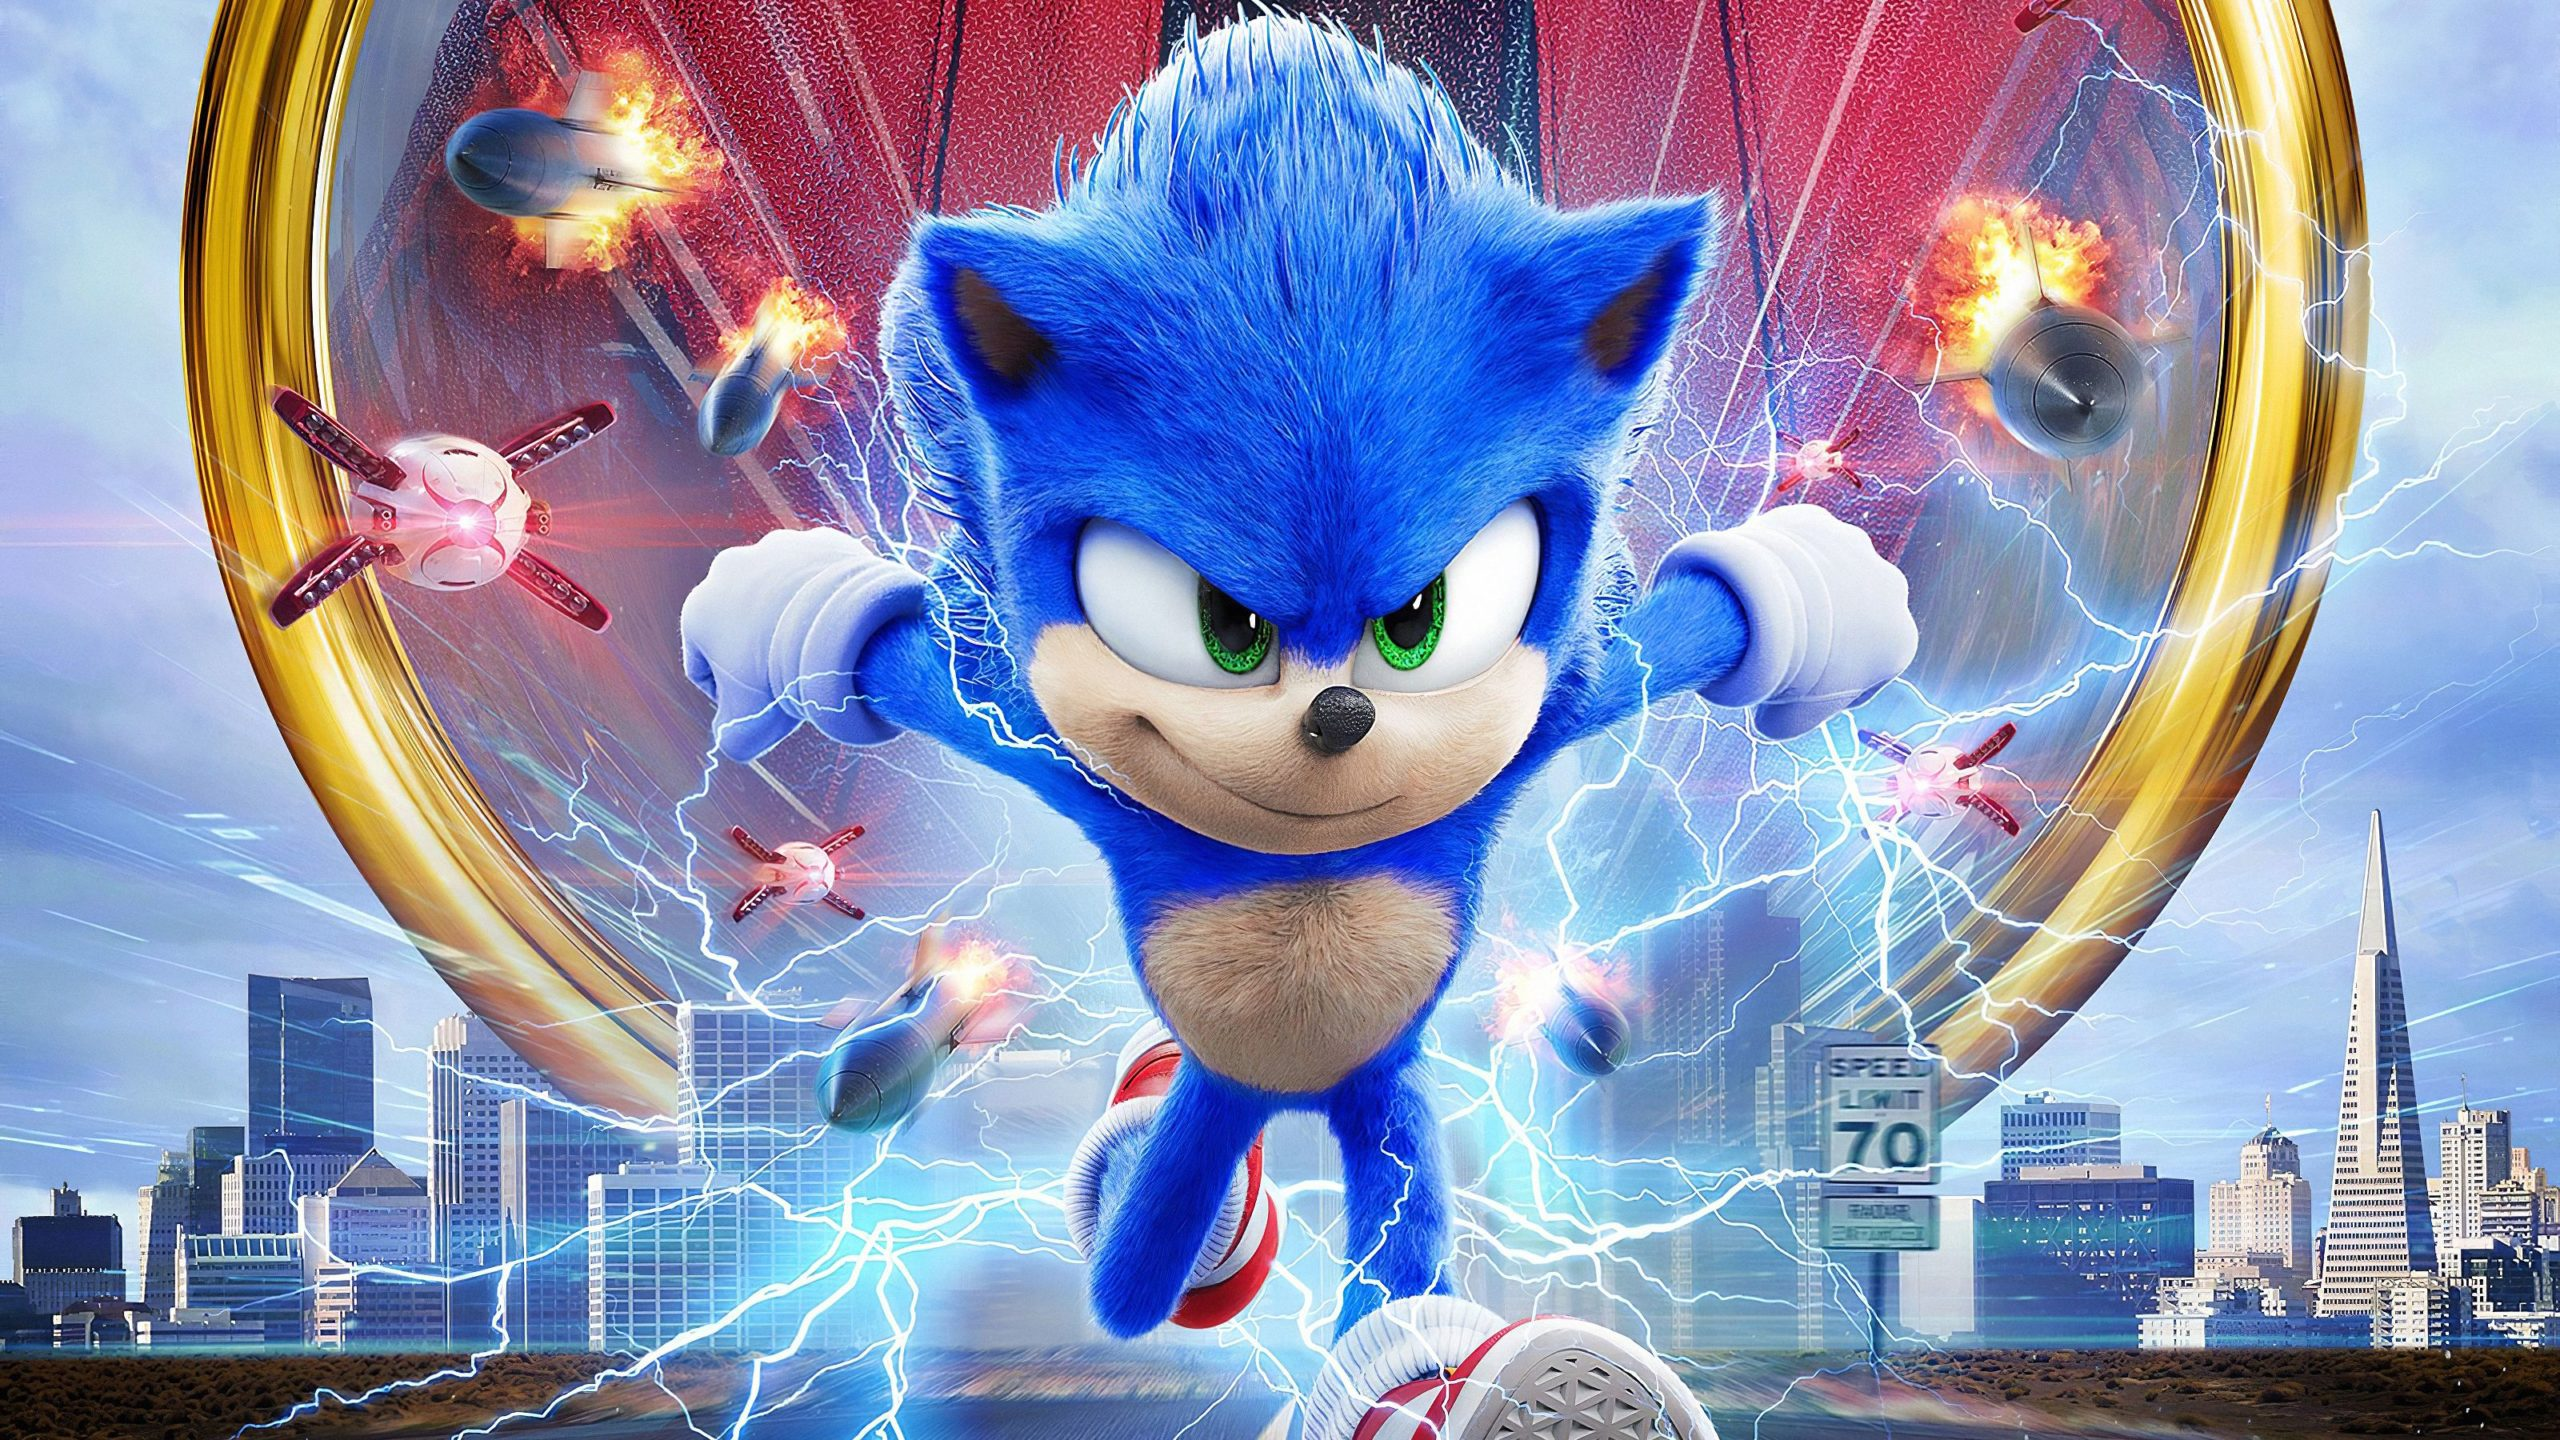 sonic the hedgehog desktop backgrounds